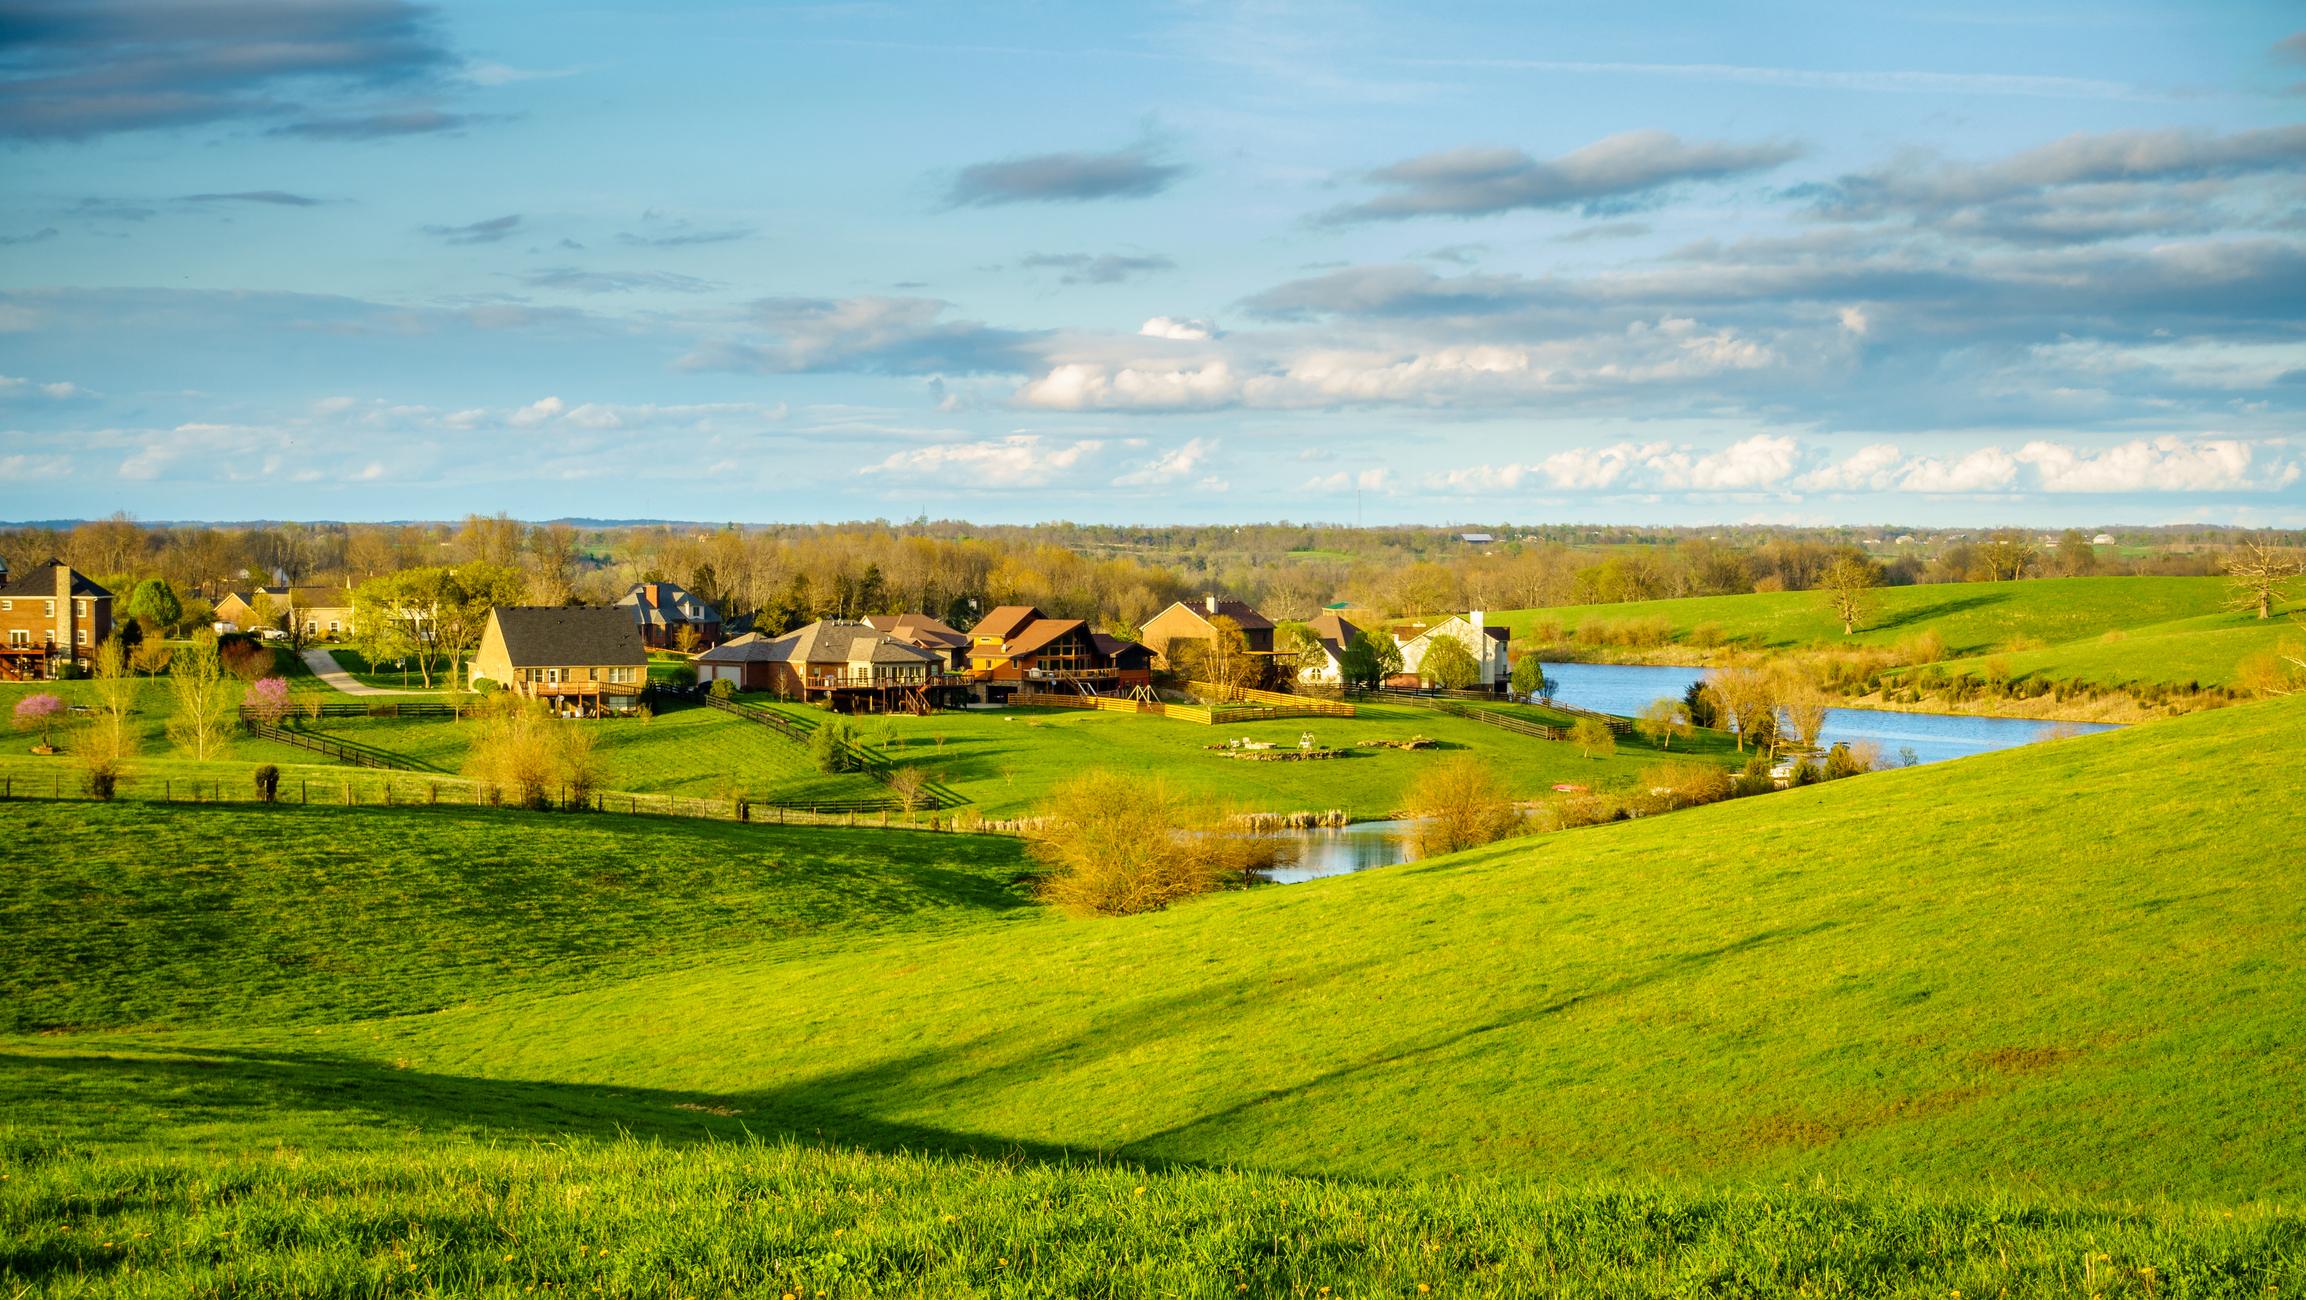 Green fields and a bucolic scene